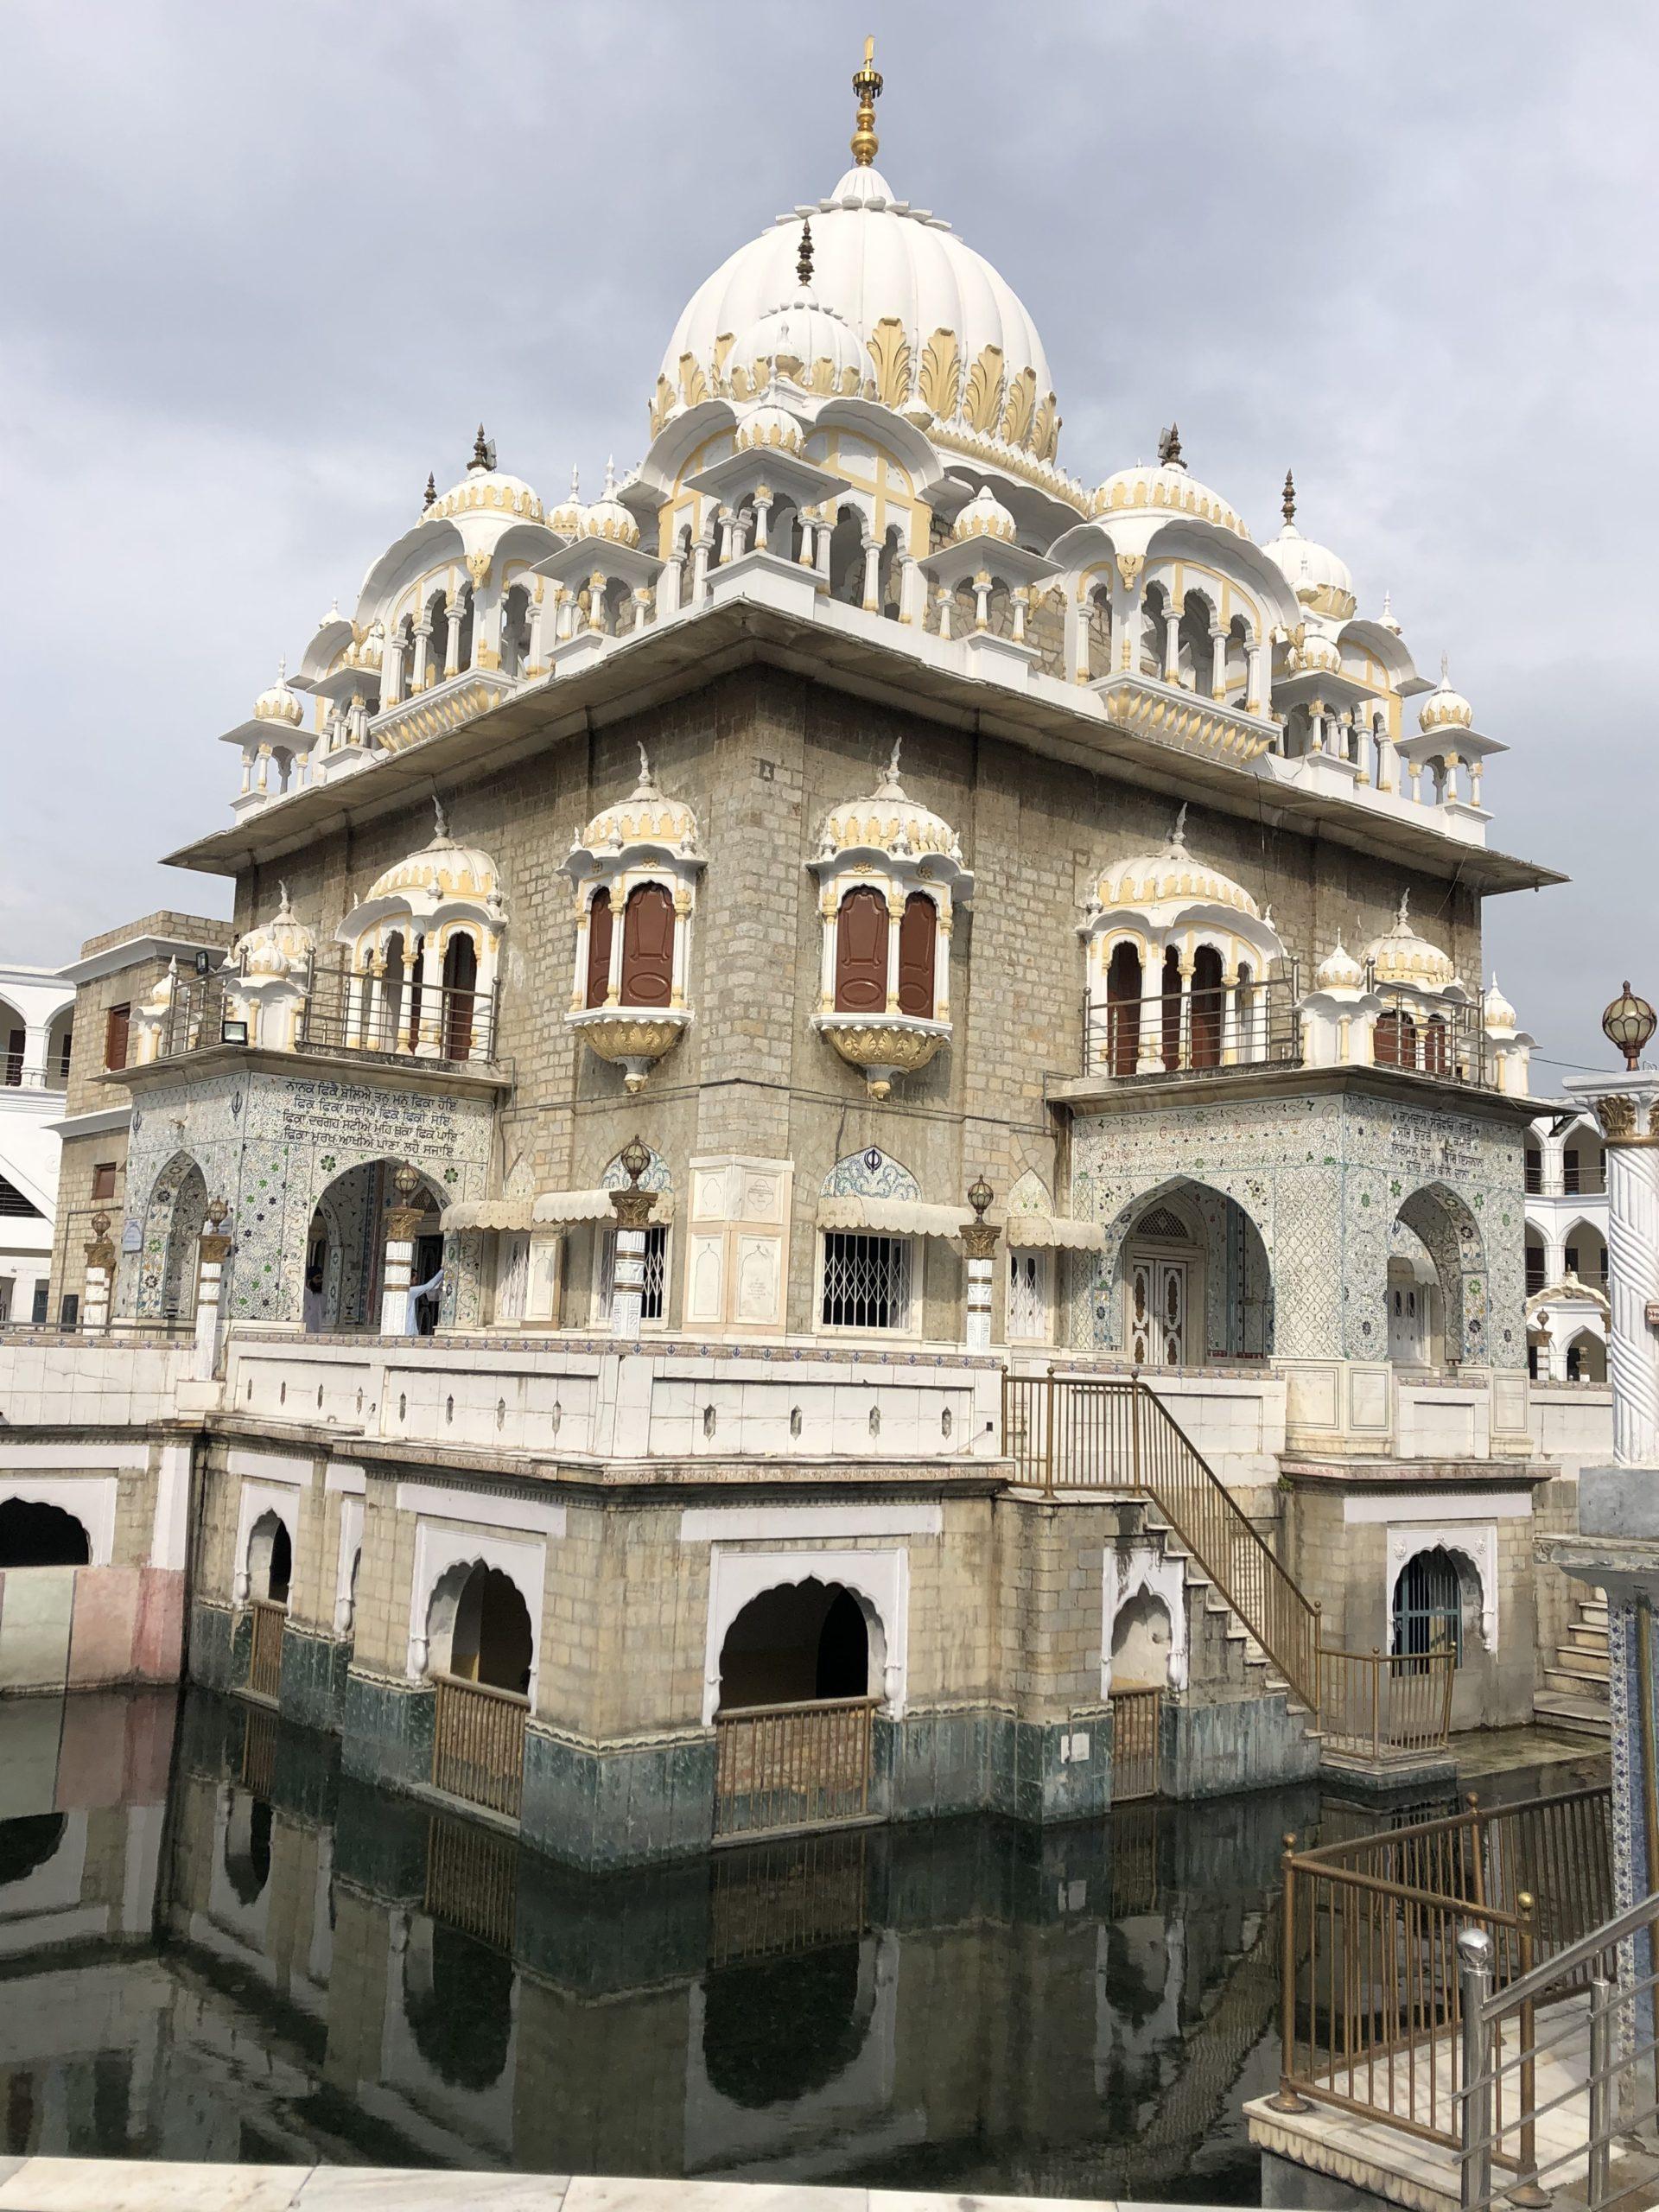 Gurudwara Panja Sahib Photo by Sonia Dhami